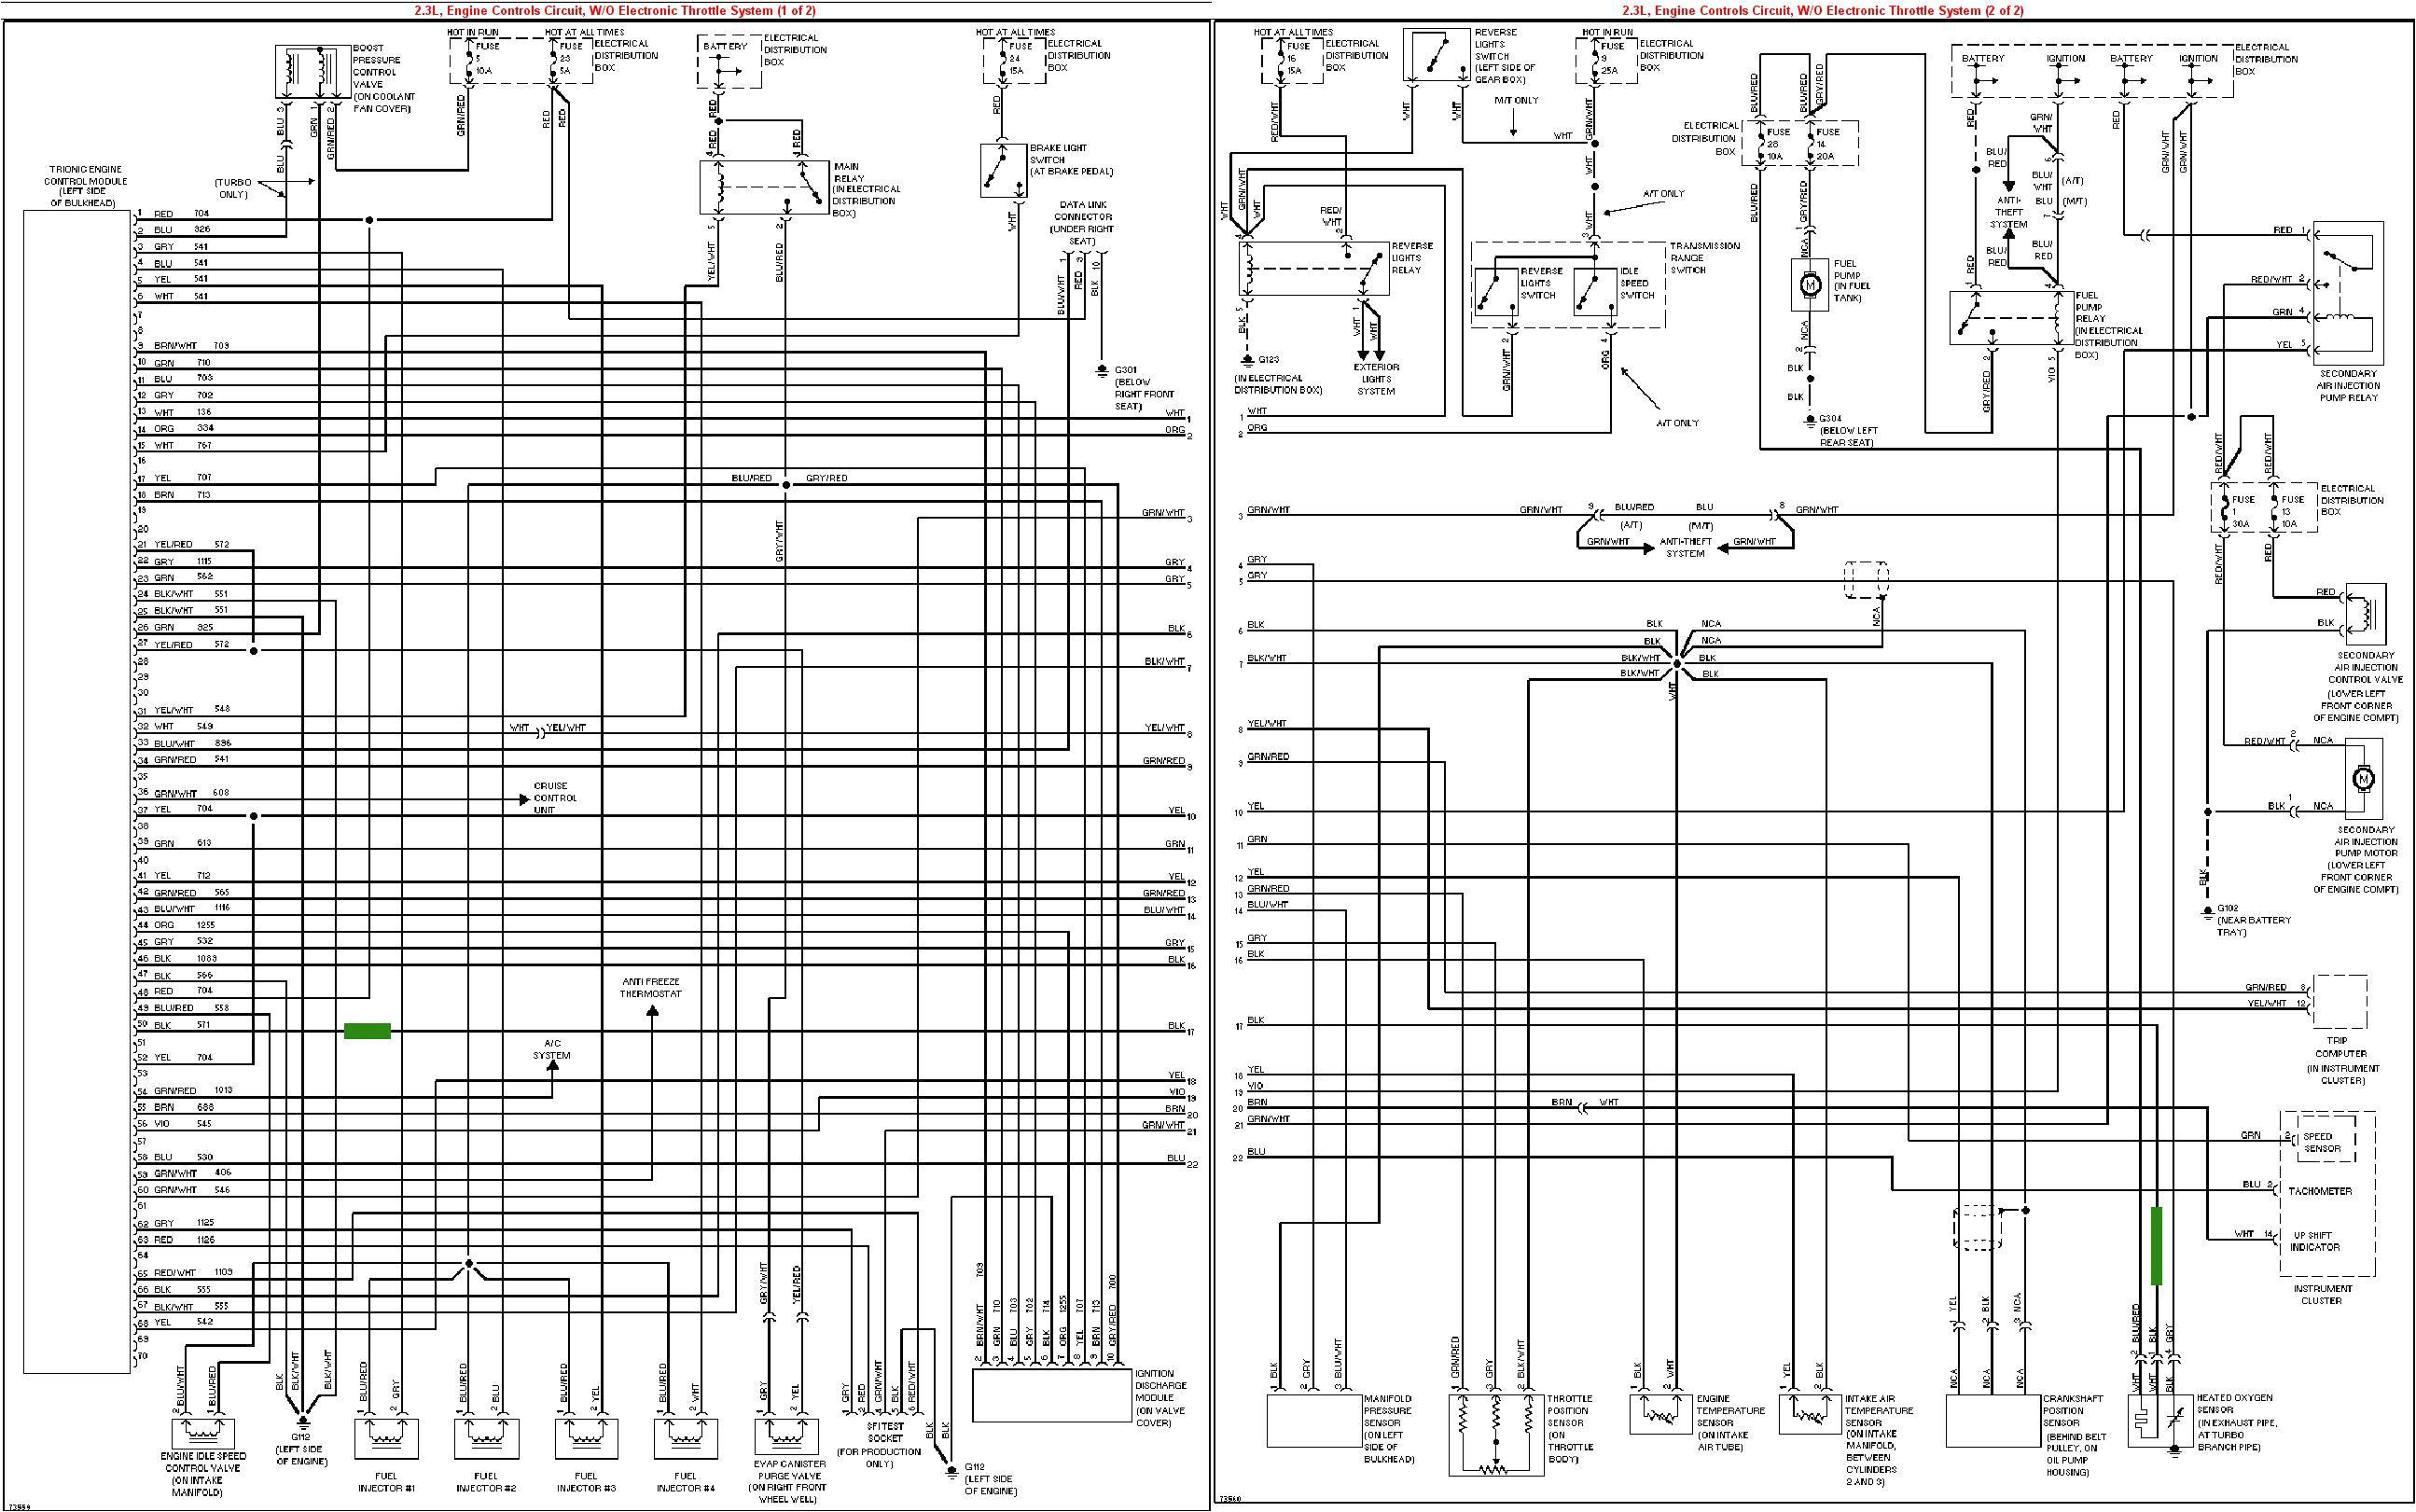 saab 93 wiring diagram wiring diagram namewiring diagram 2003 saab 9 3 convertible wiring diagram meta